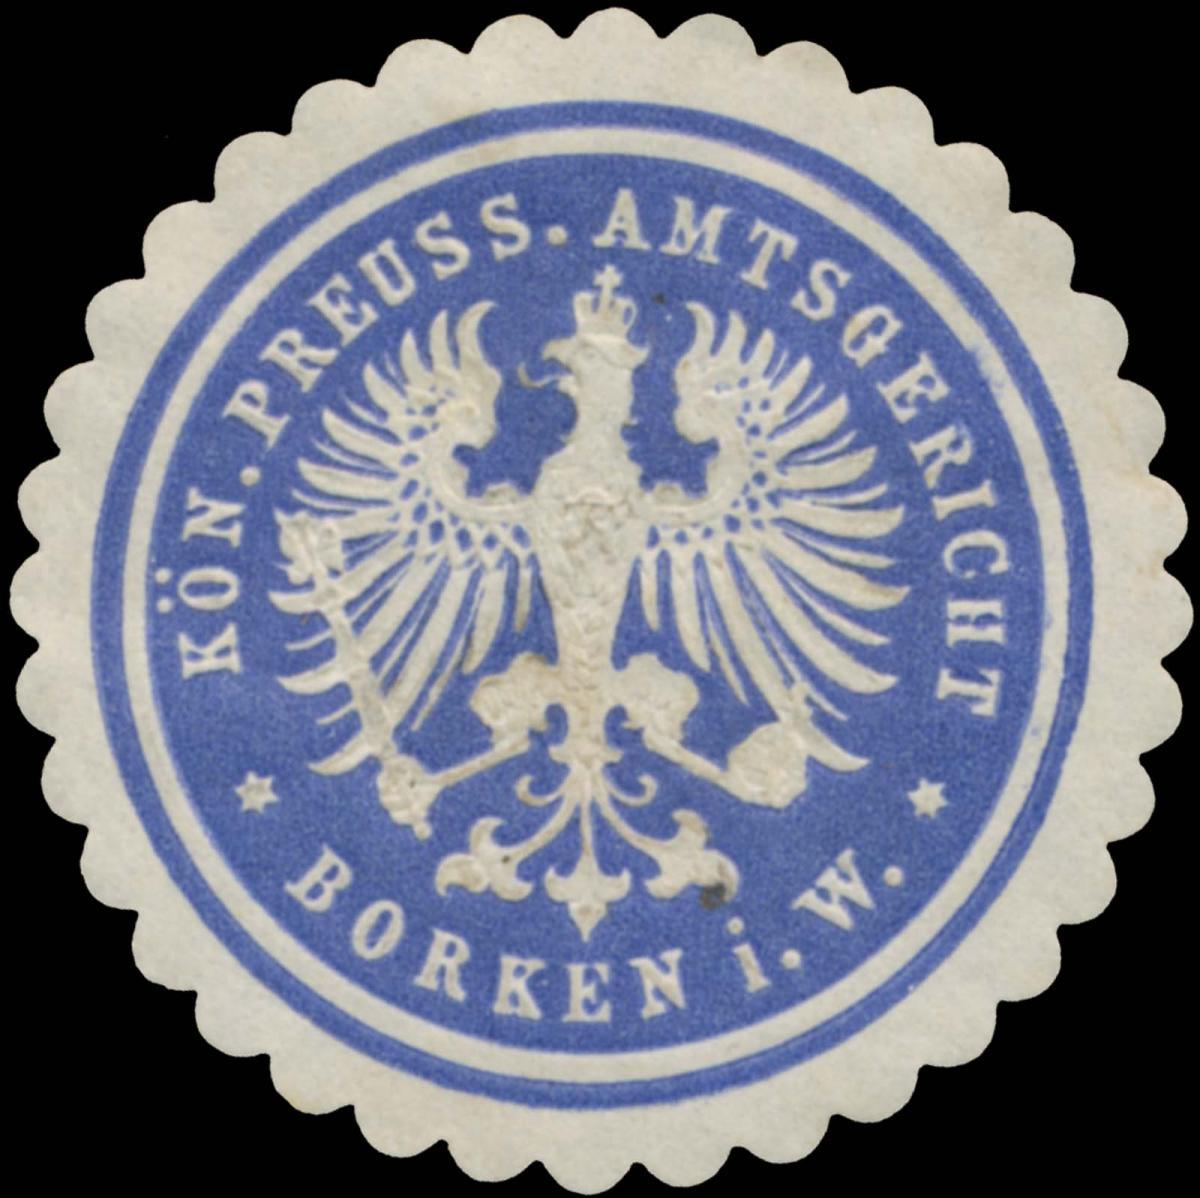 K.Pr. Amtsgericht Borken i.W.